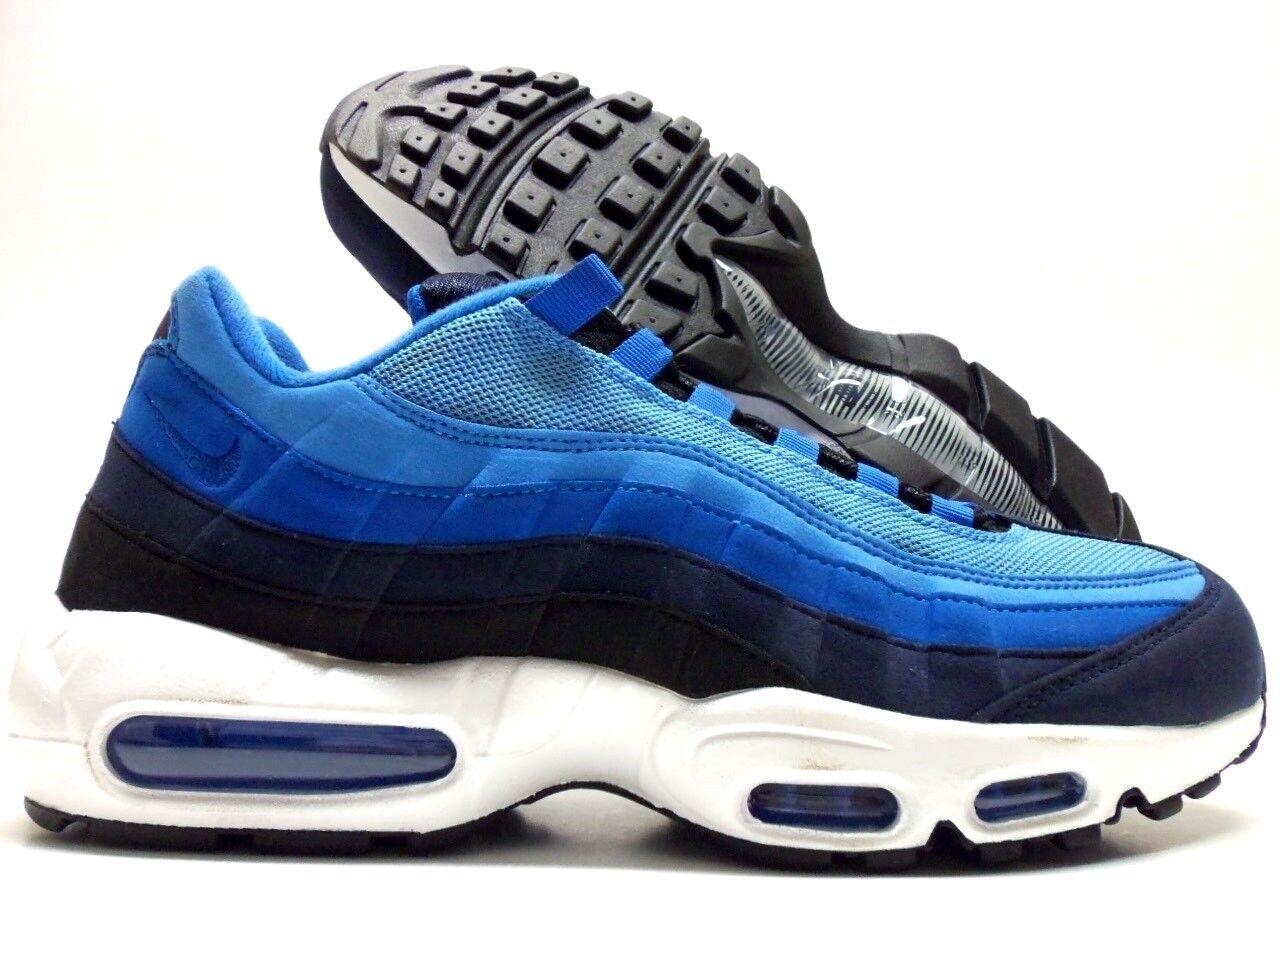 Nike air max 95 - universität blau blau blau / schwarz-Weiß größe 10,5 (männer 818592-996] 6150d2